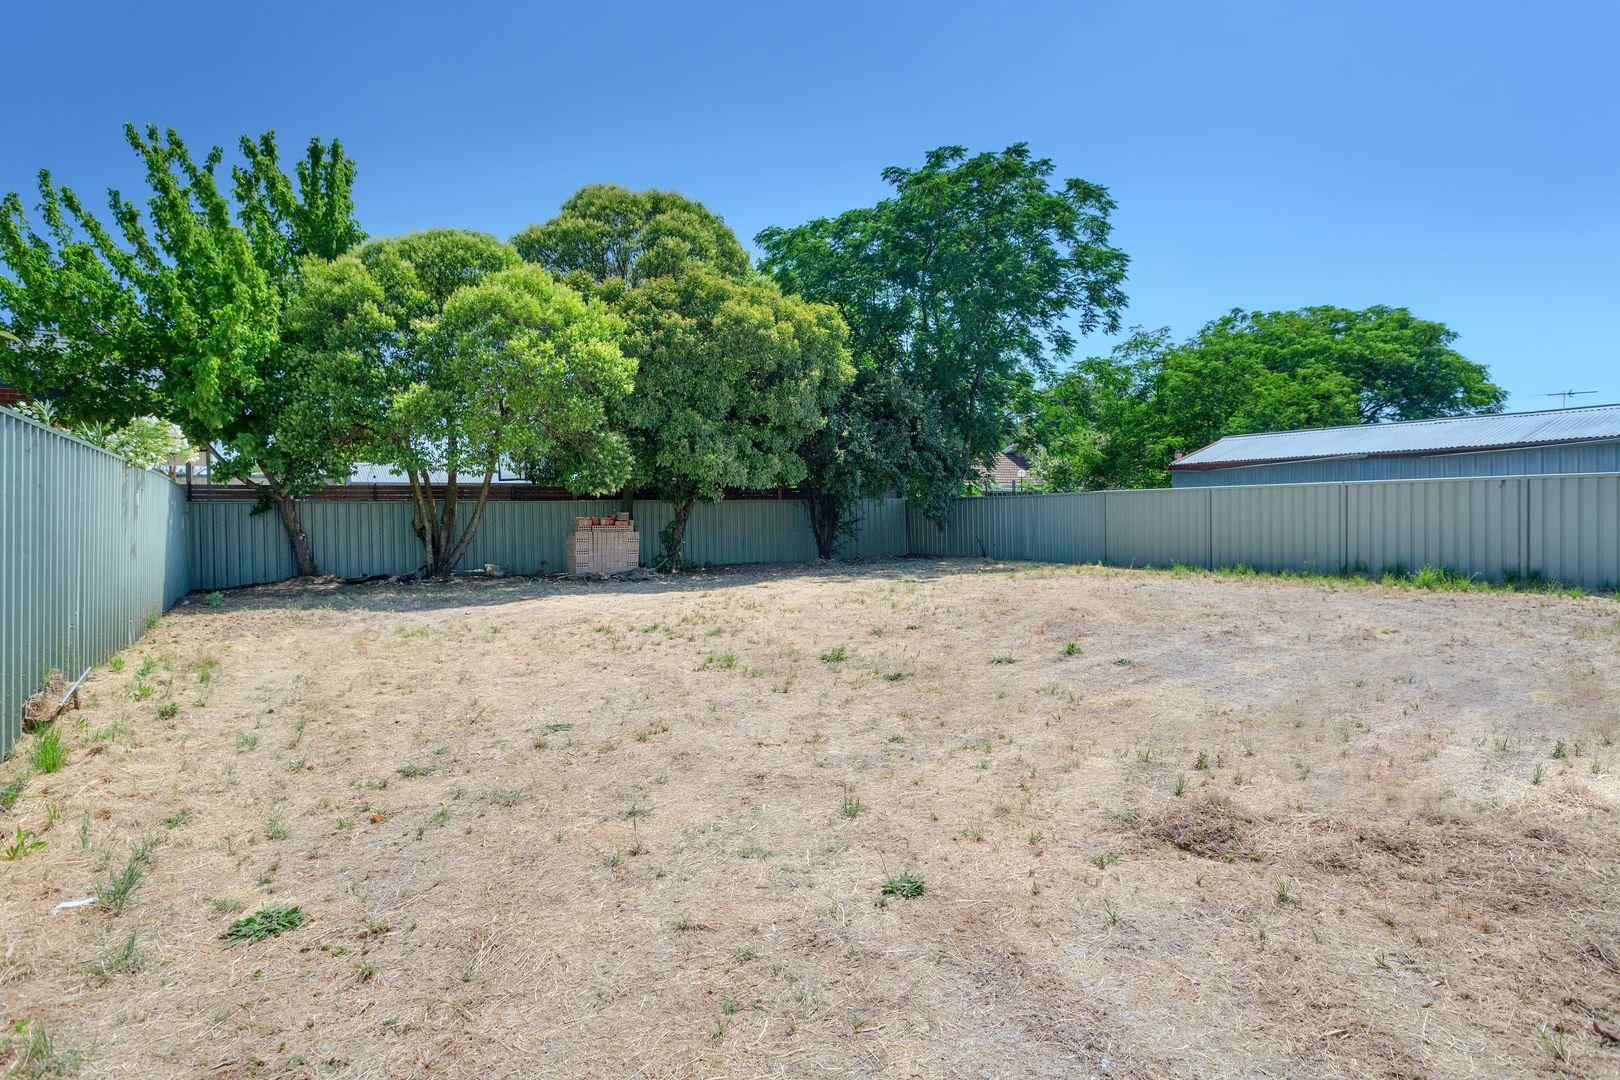 2/190 Lawrence  Street, Wodonga VIC 3690, Image 0